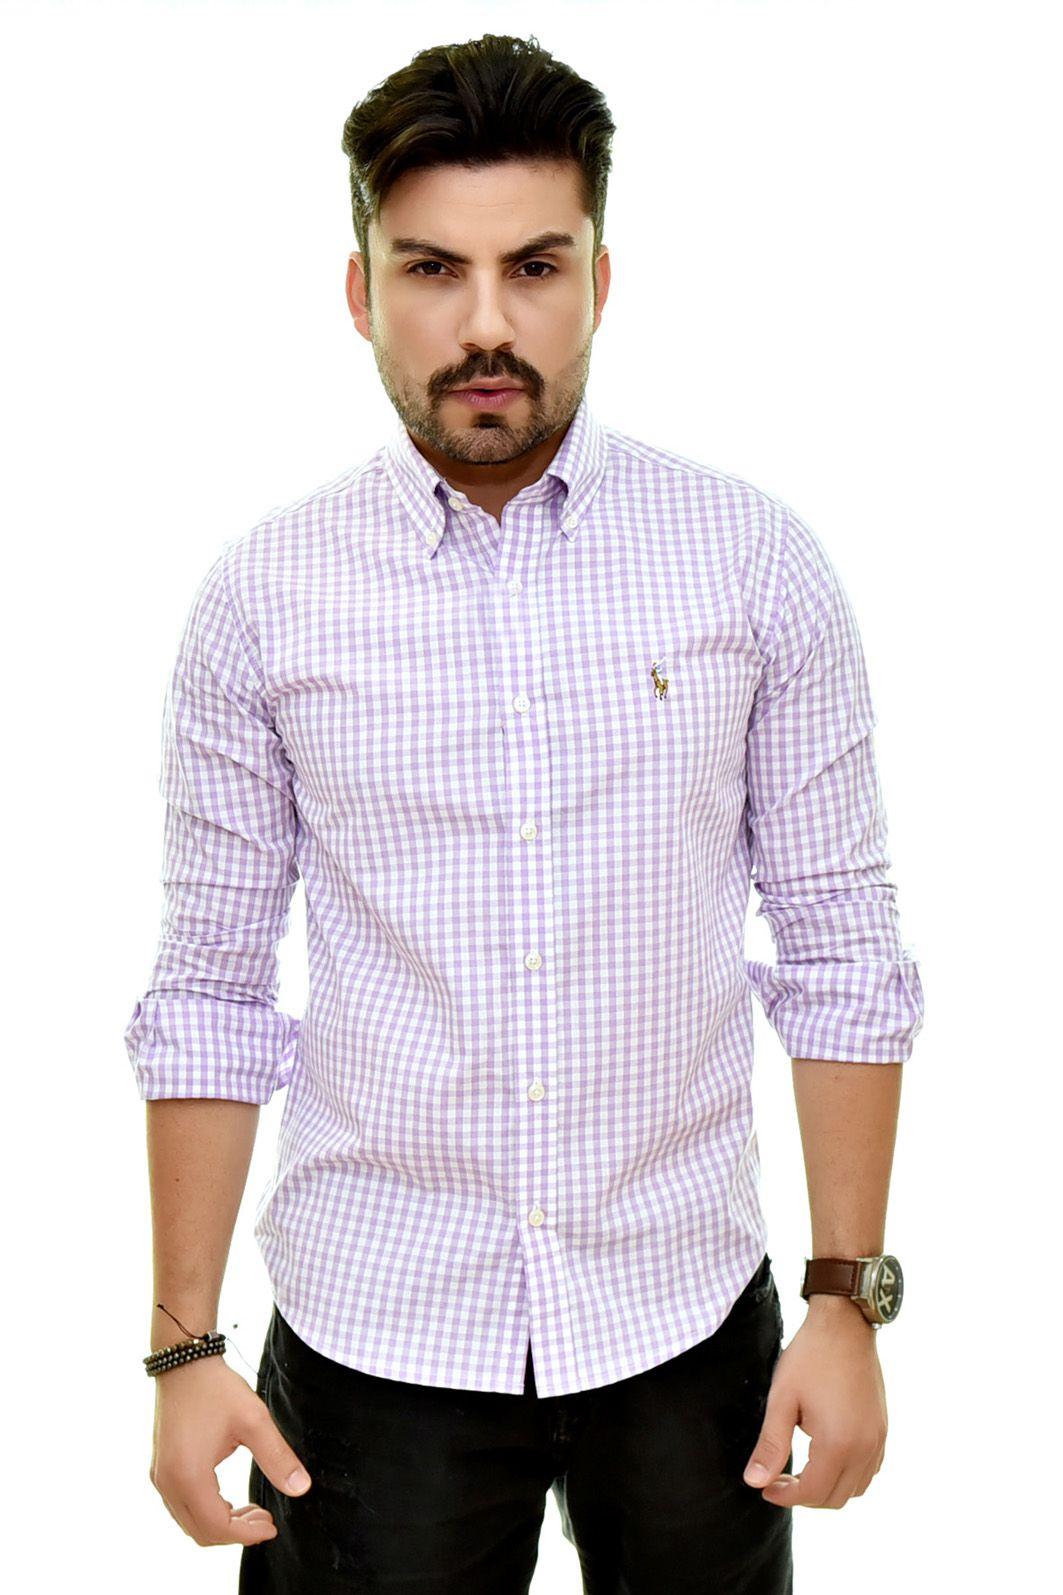 Camisa Social RL Xadrez Lilas Colored - Custom Fit  - Ca Brasileira